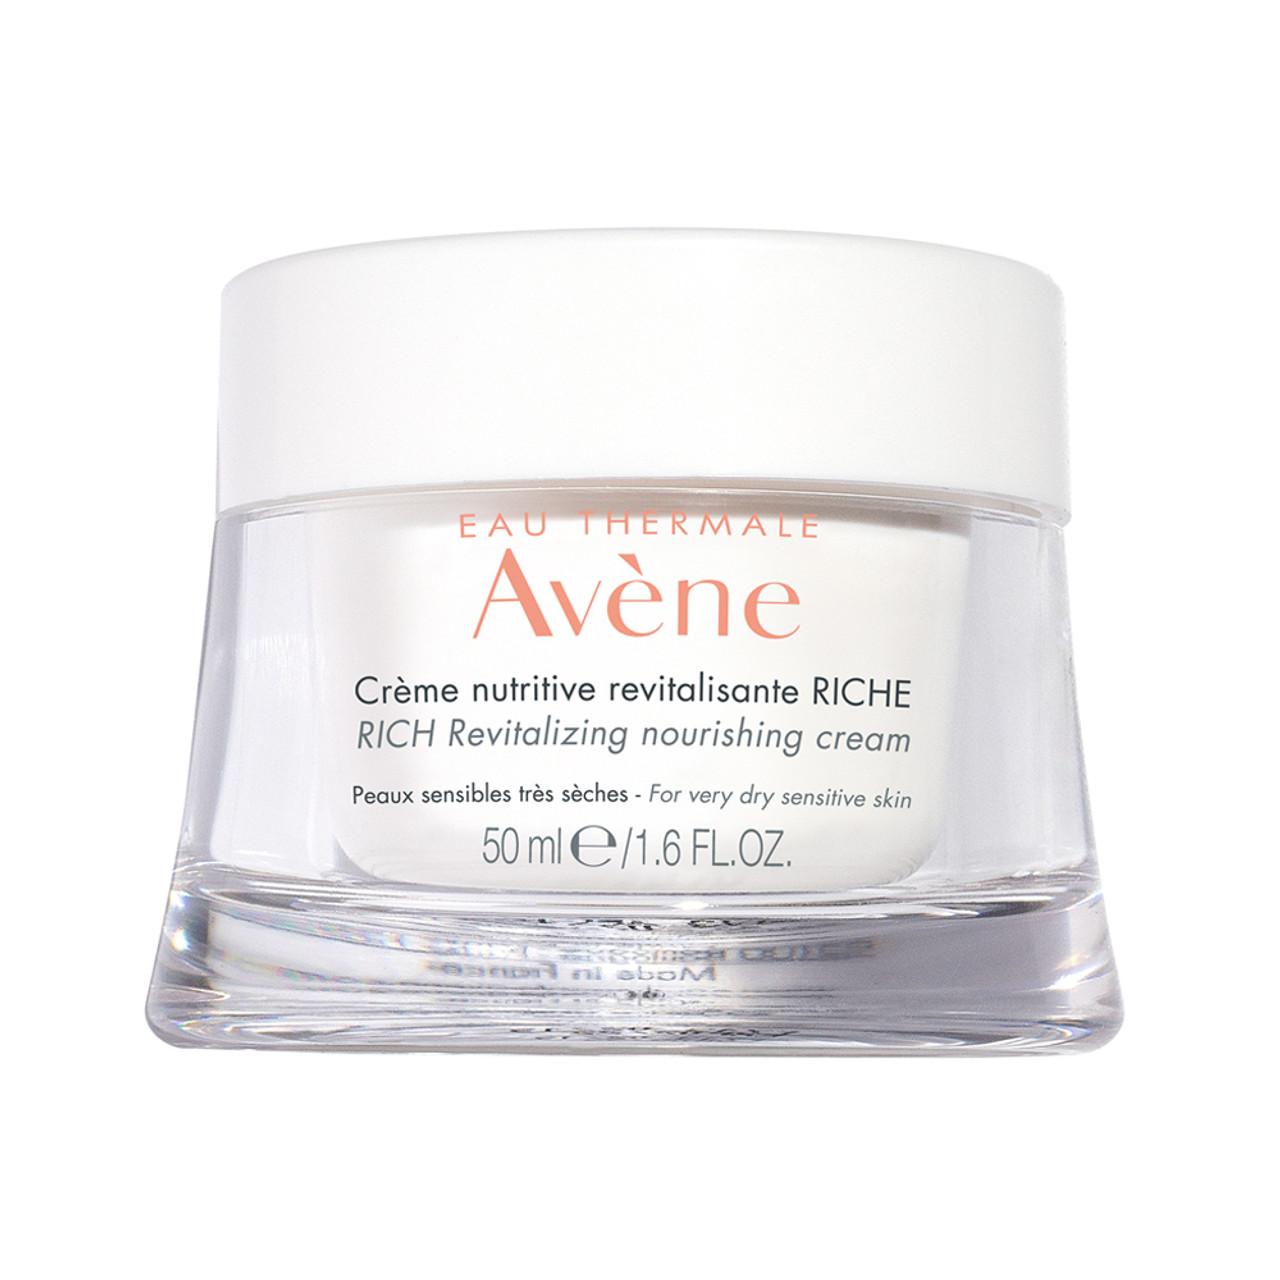 Avene RICH Revitalizing Nourishing Cream